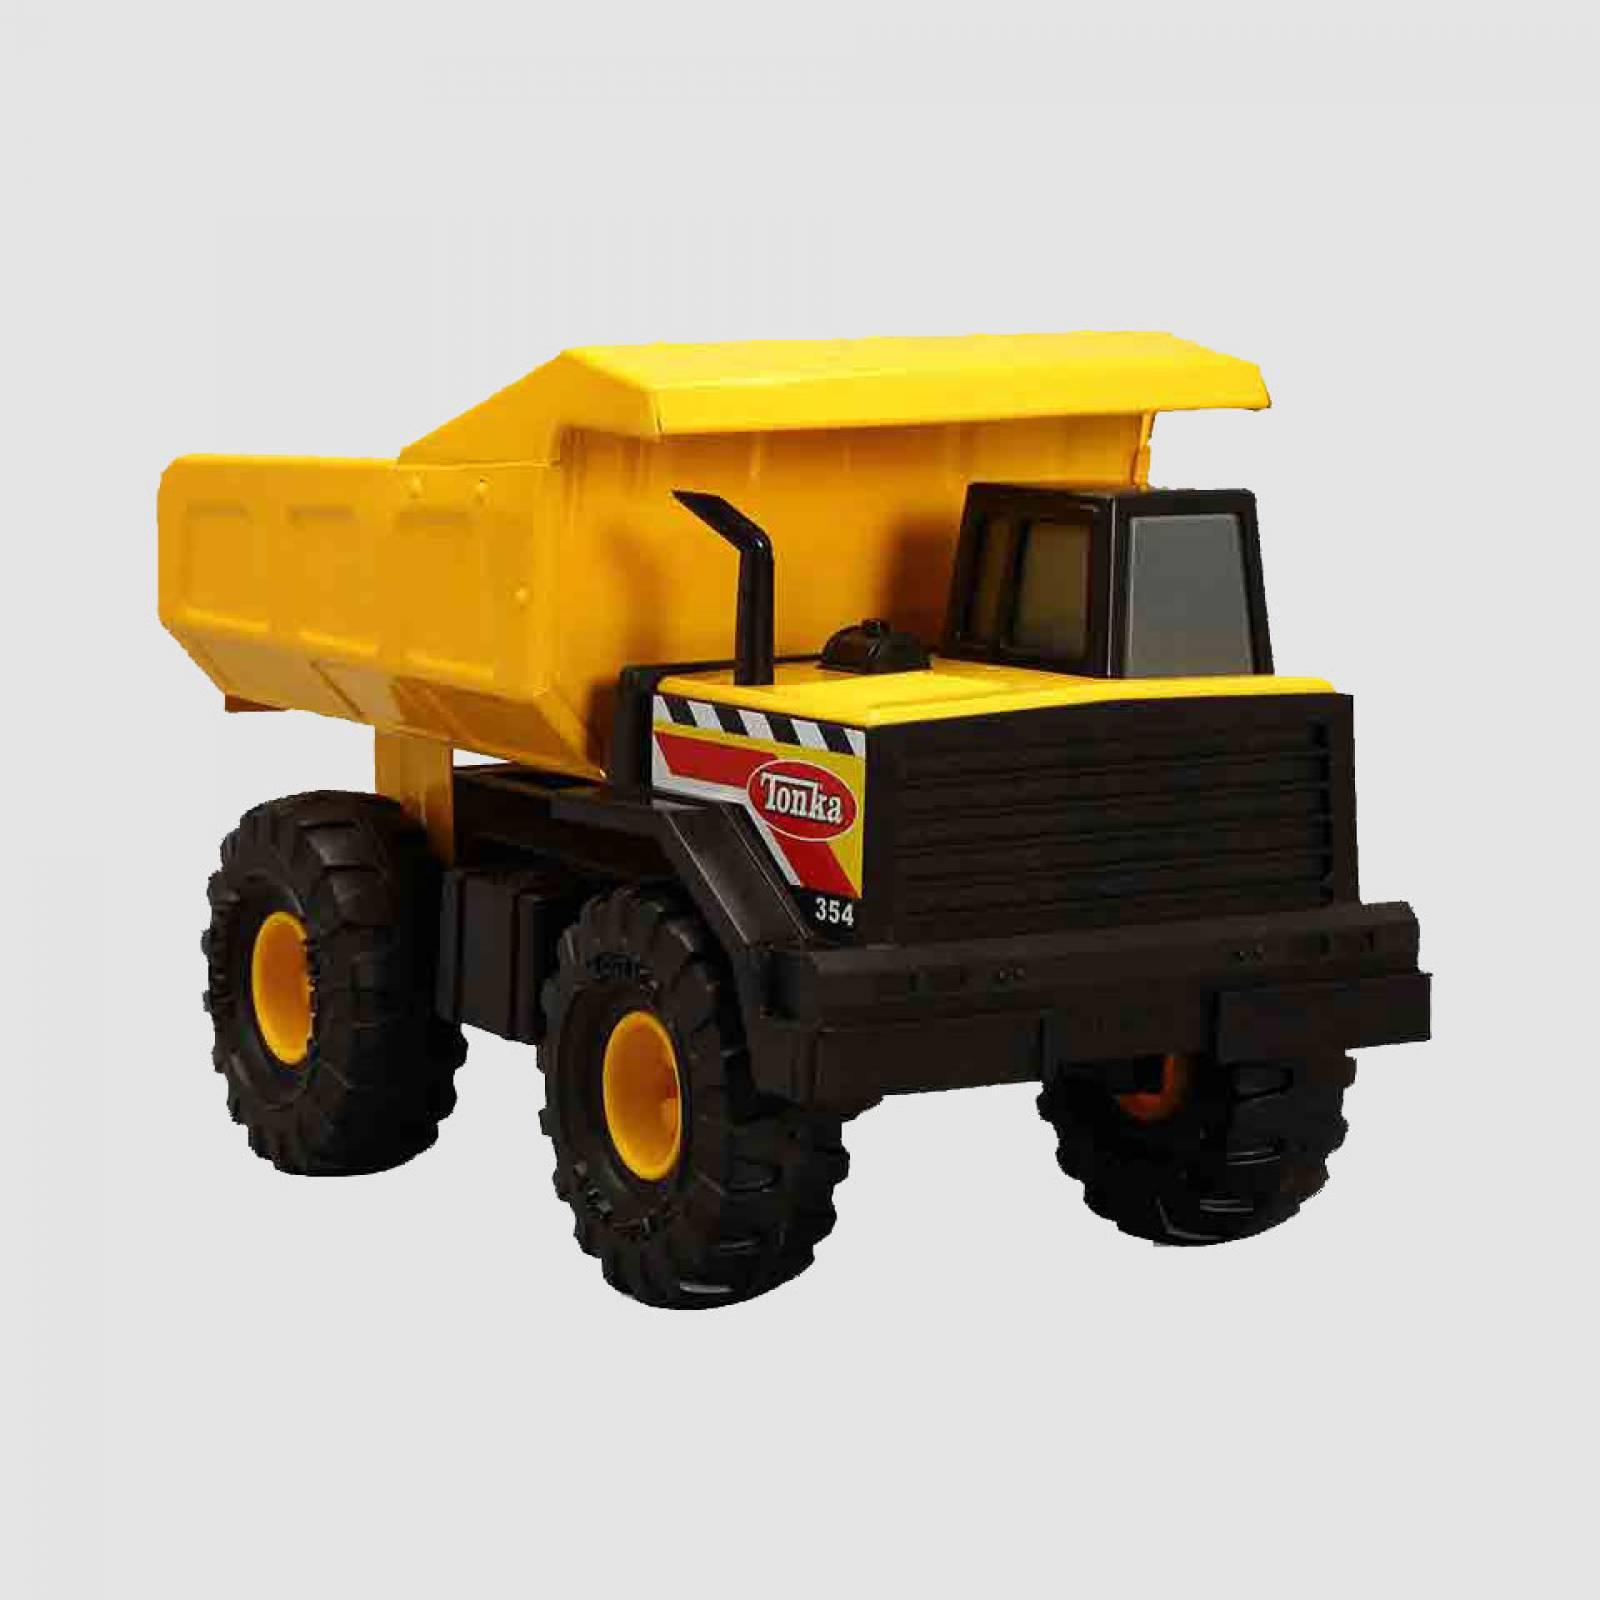 Tonka Steel Mighty Dump Truck